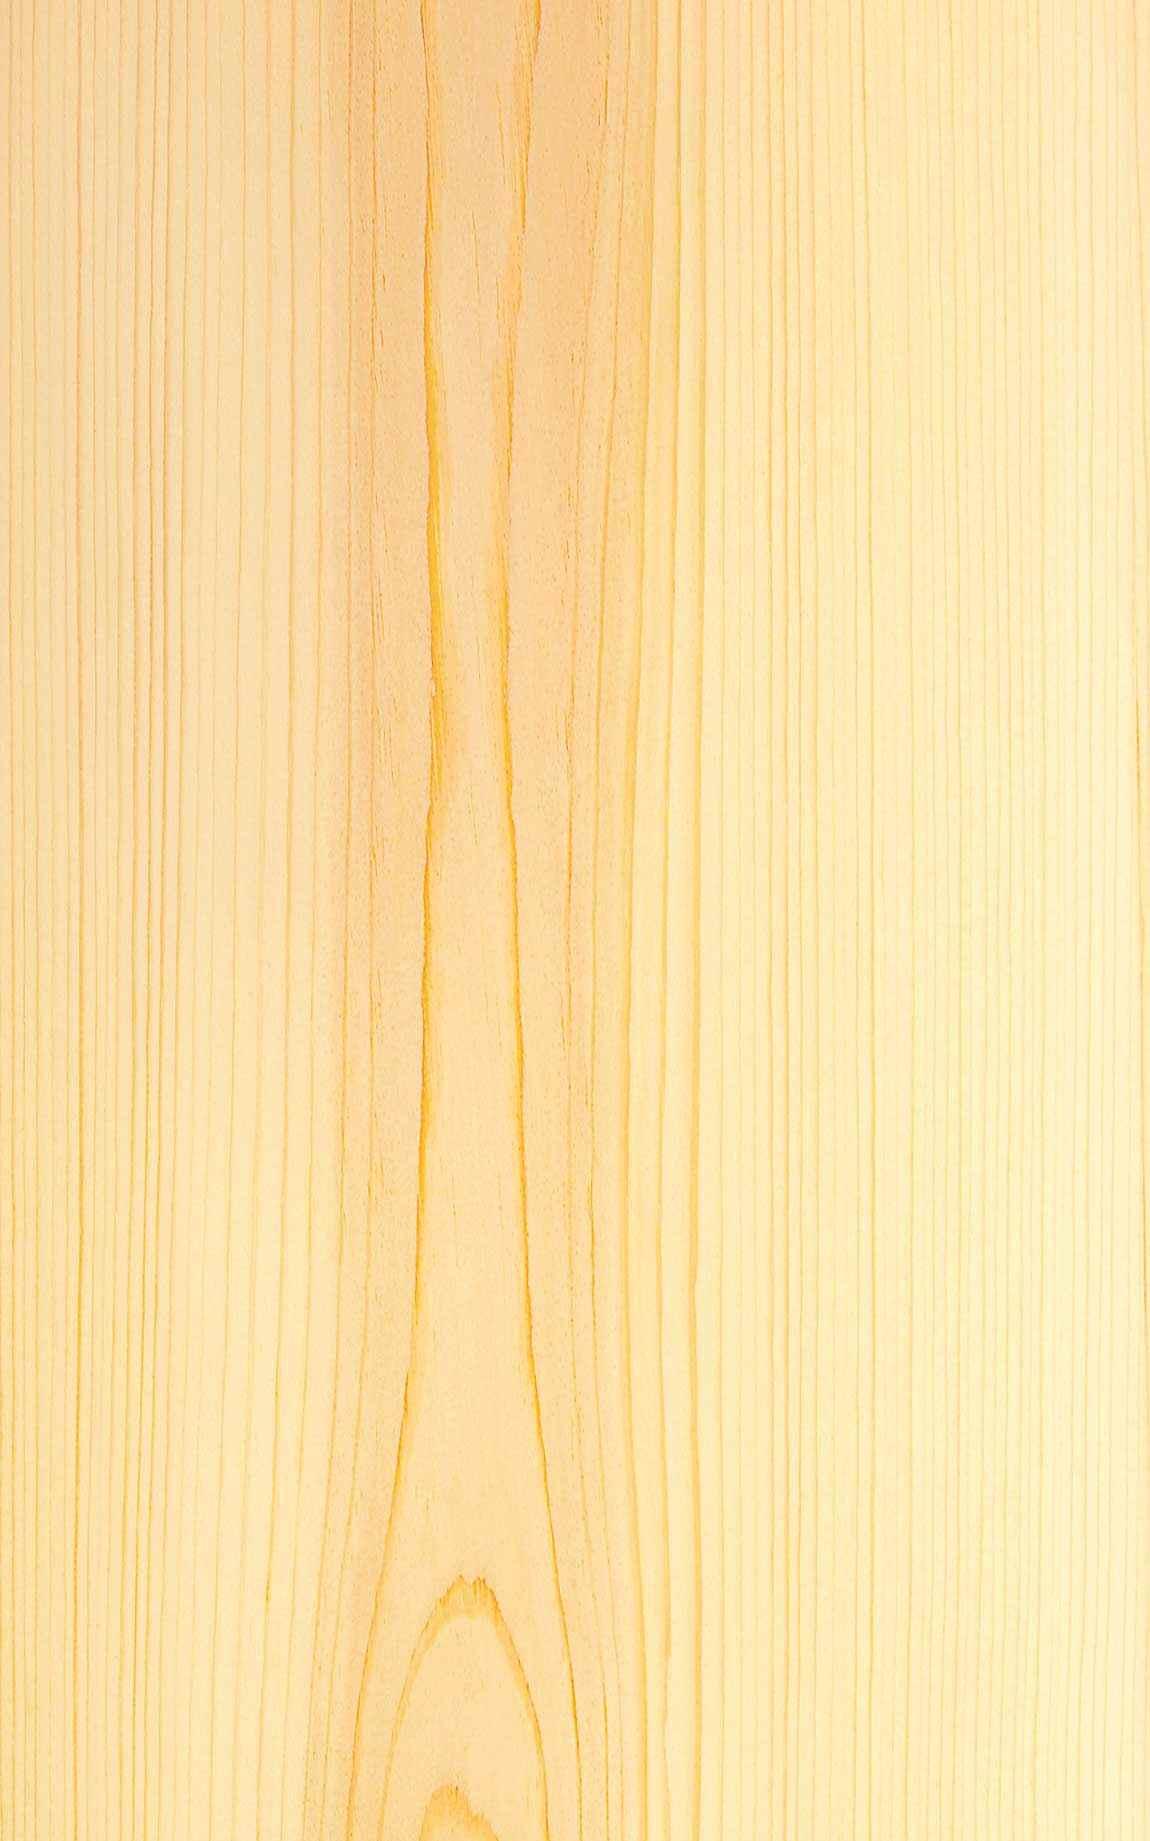 Quality Timber Doors And Windows Trade Manufacturers